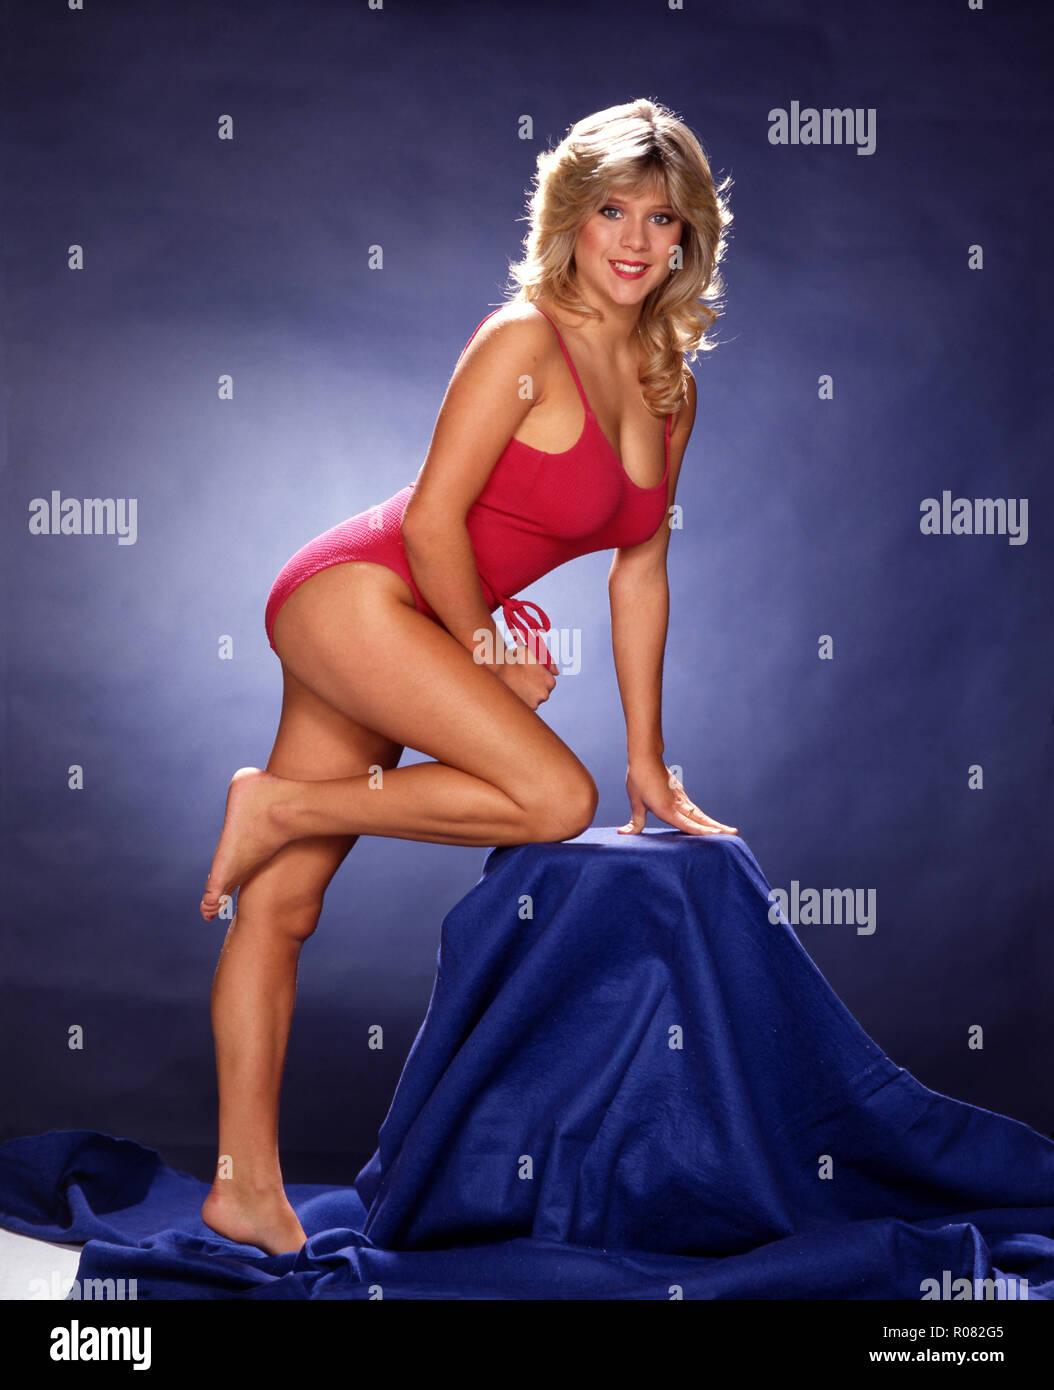 Samantha Fox, Indoors Stock Photo